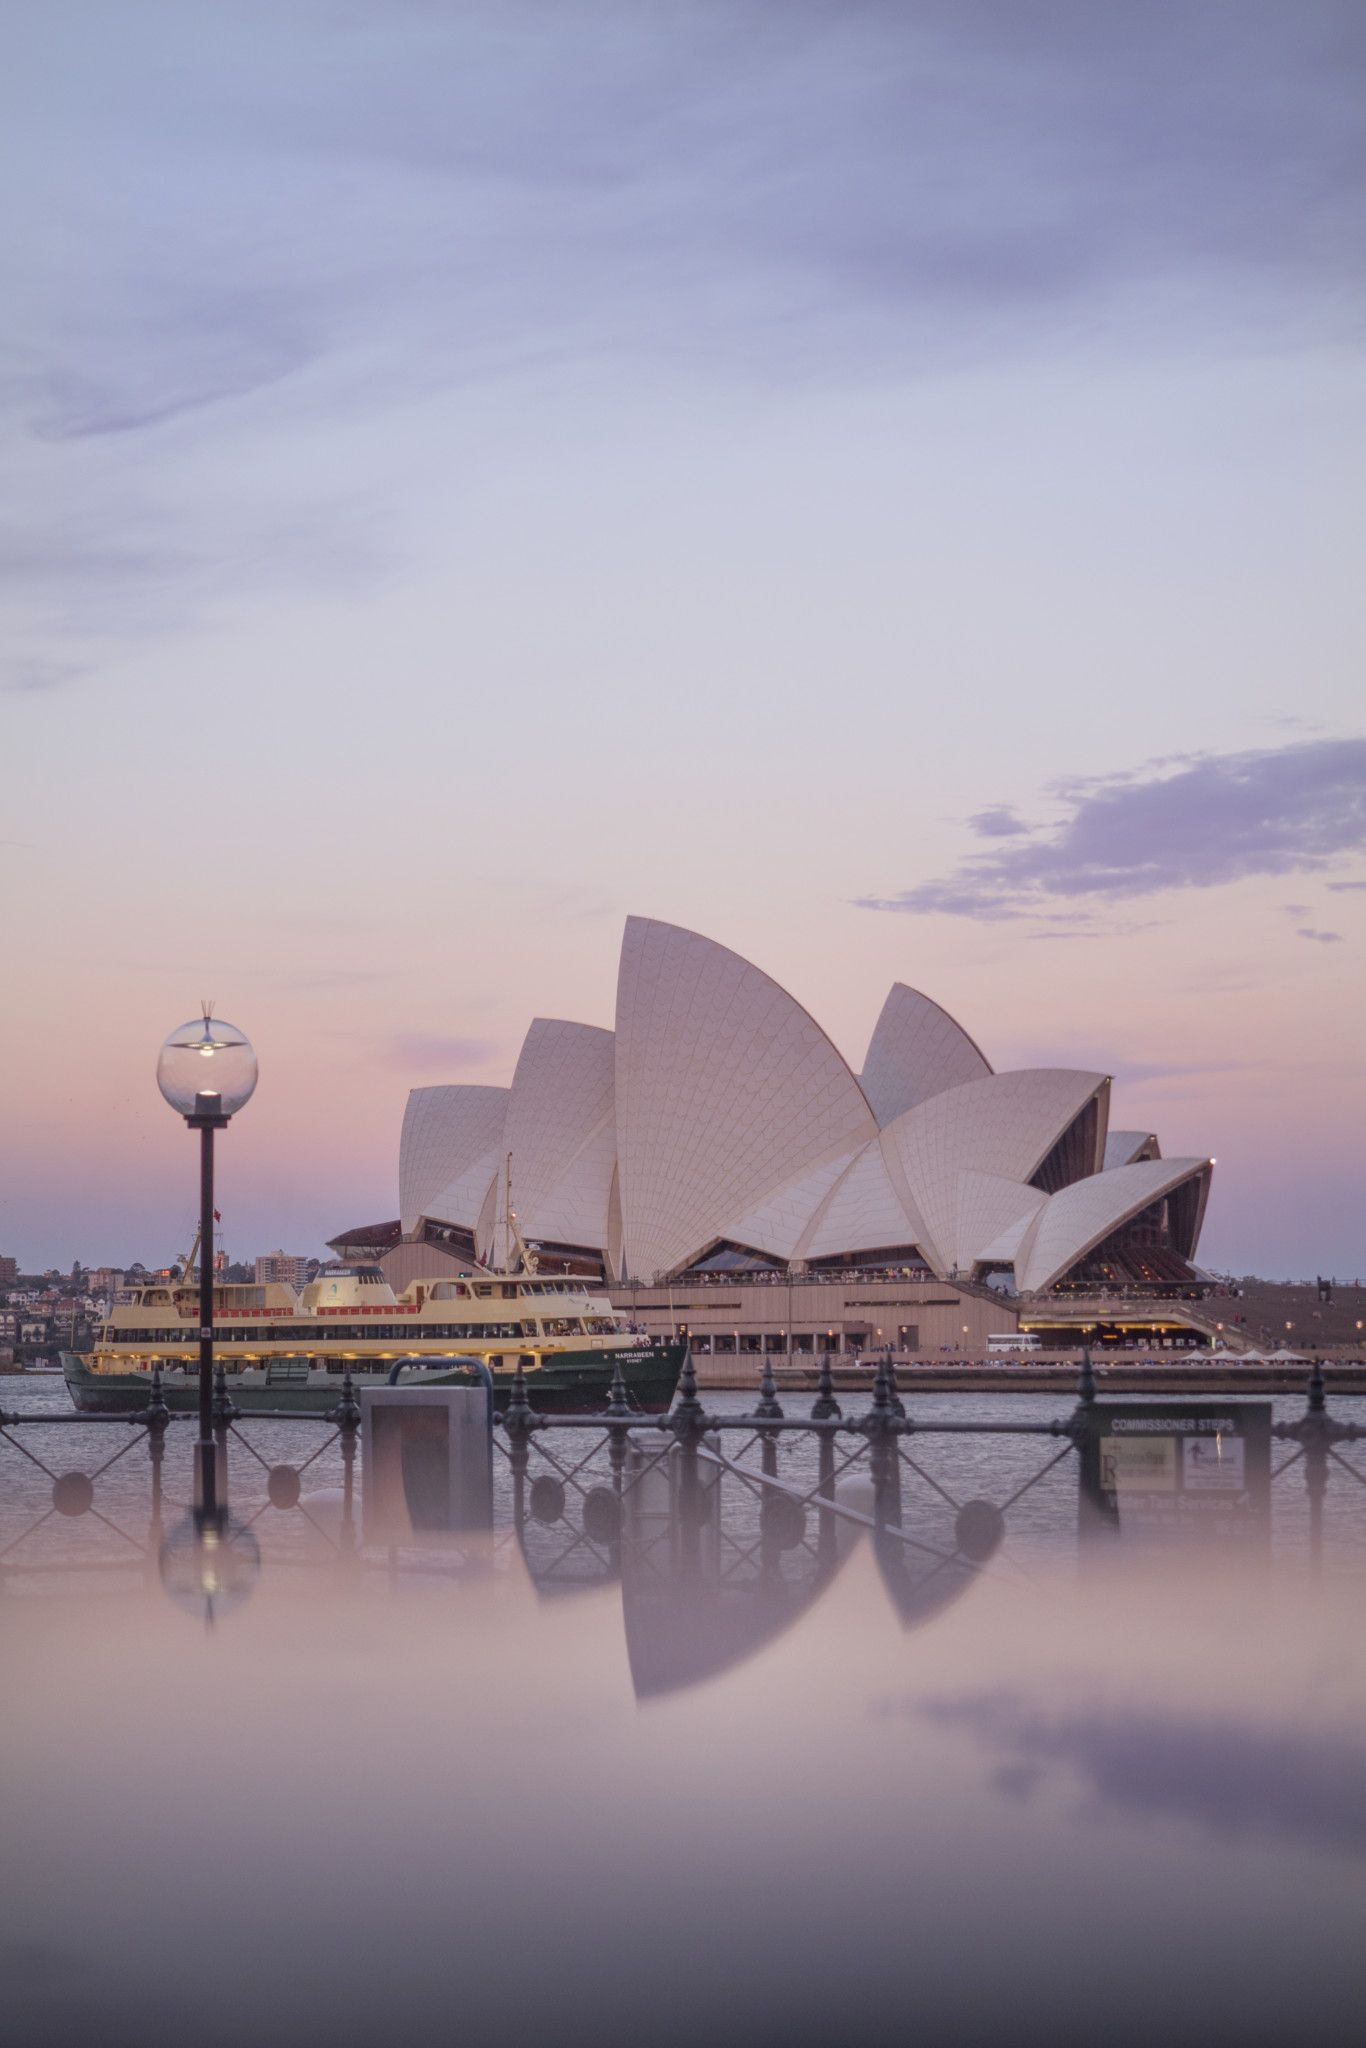 The Sydney Opera House in Photographs - Sydney, Australia ...